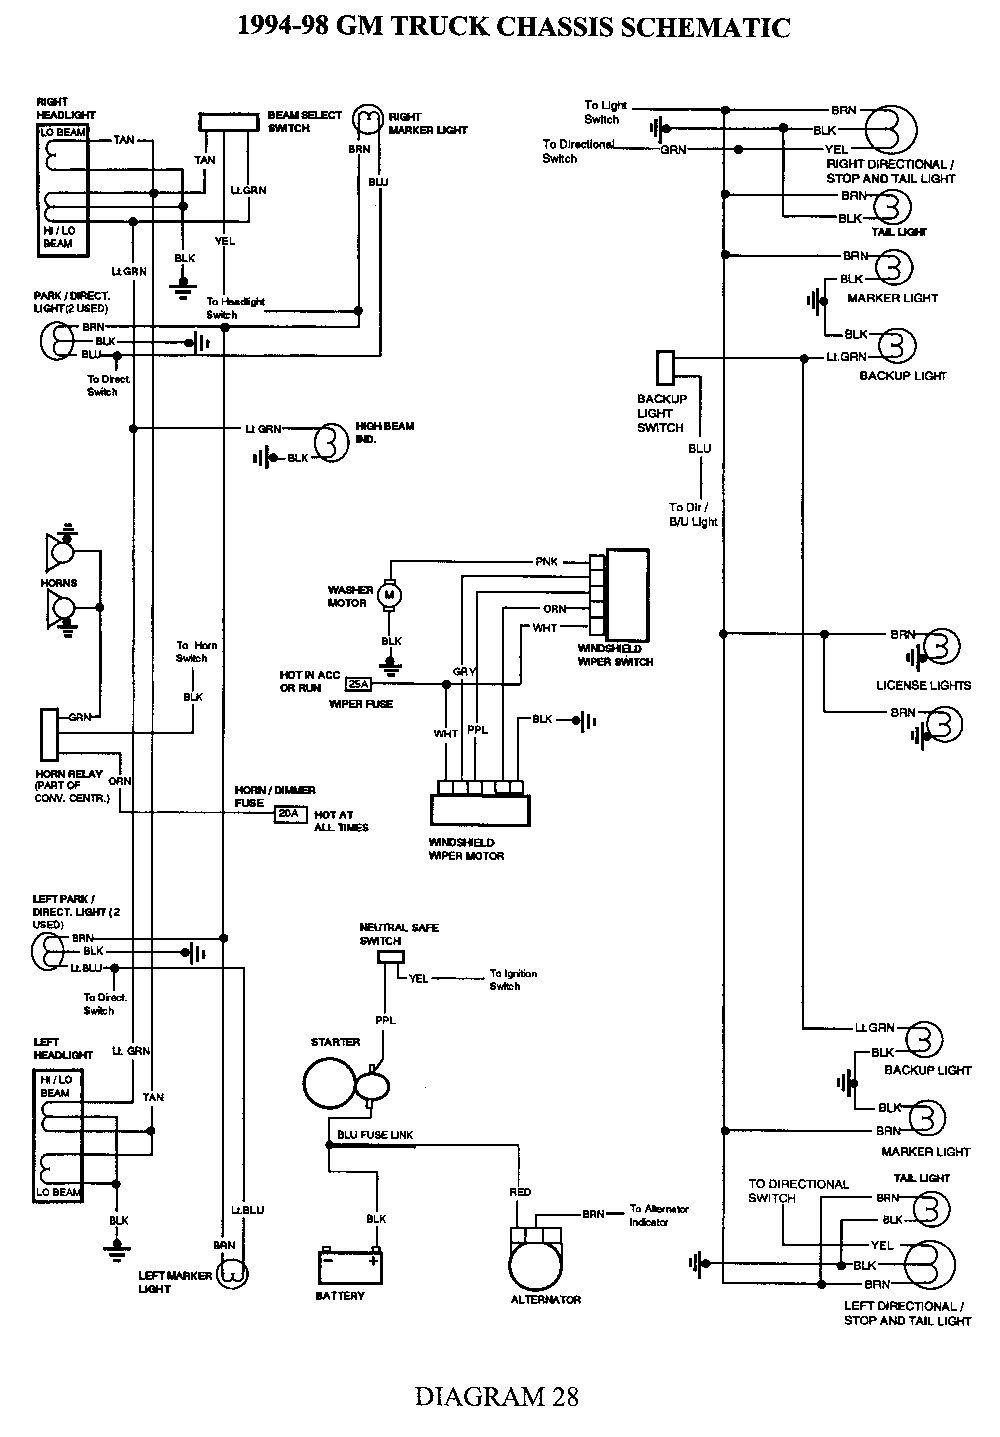 2008 Chevy Silverado Tail Light Wiring Diagram : chevy, silverado, light, wiring, diagram, Chevy, Silverado, Light, Wiring, Diagram, Export, Loose-realize, Loose-realize.congressosifo2018.it